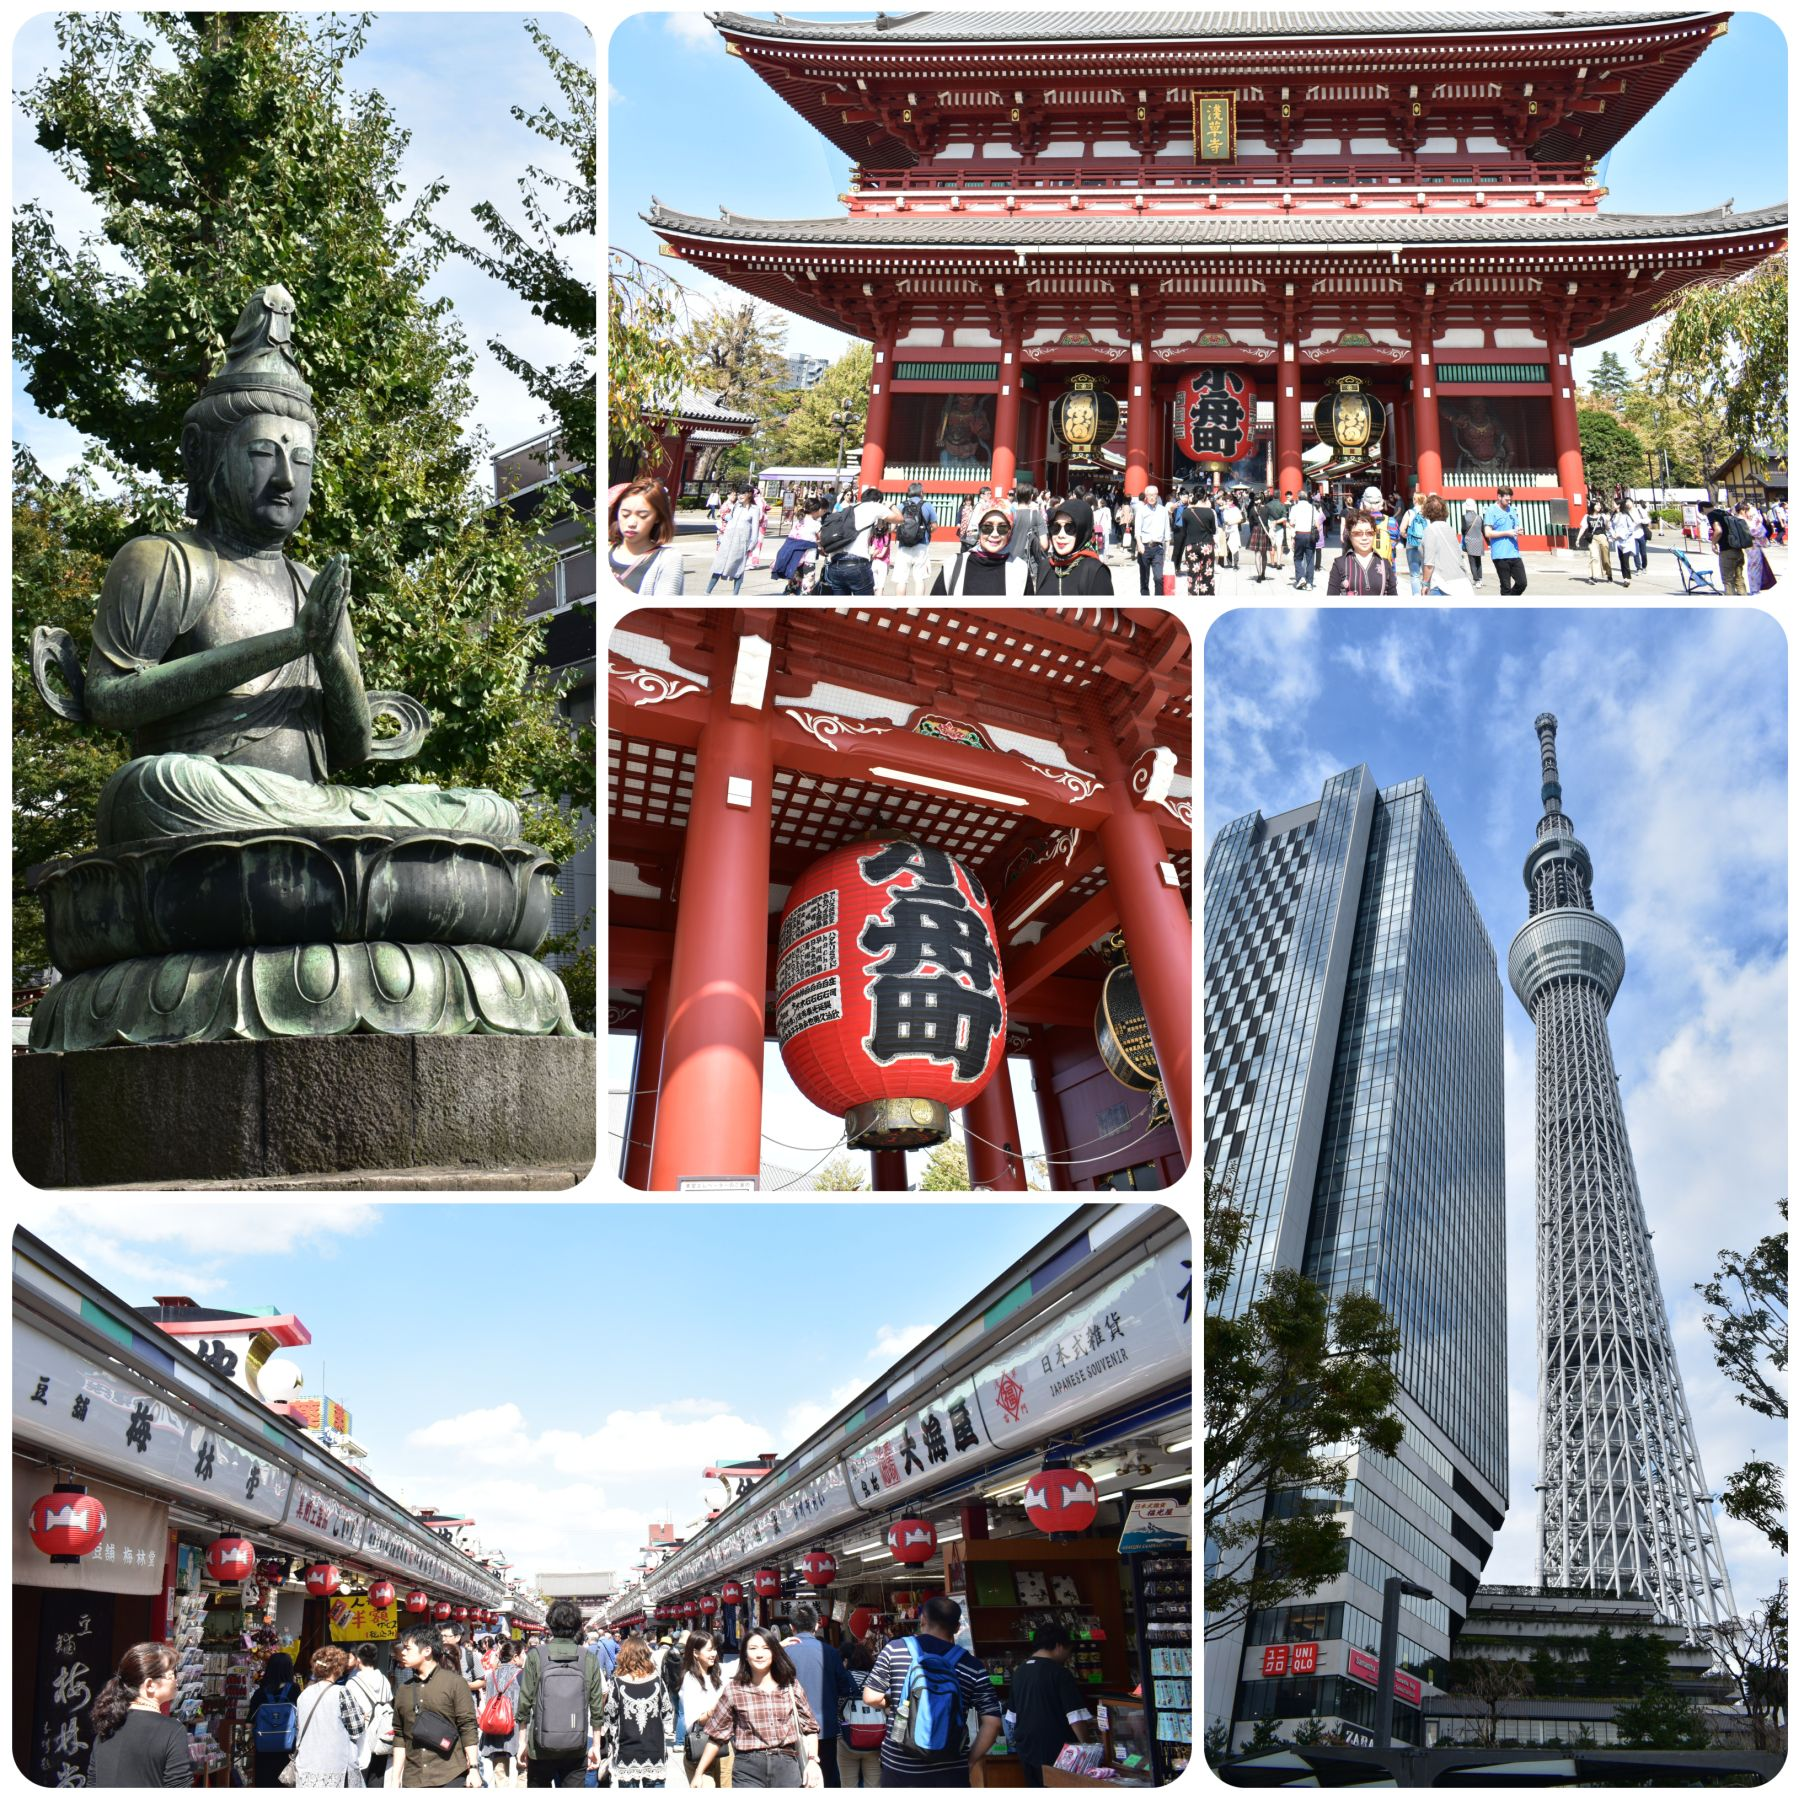 Tourist spots in Asakusa, Tokyo, Japan